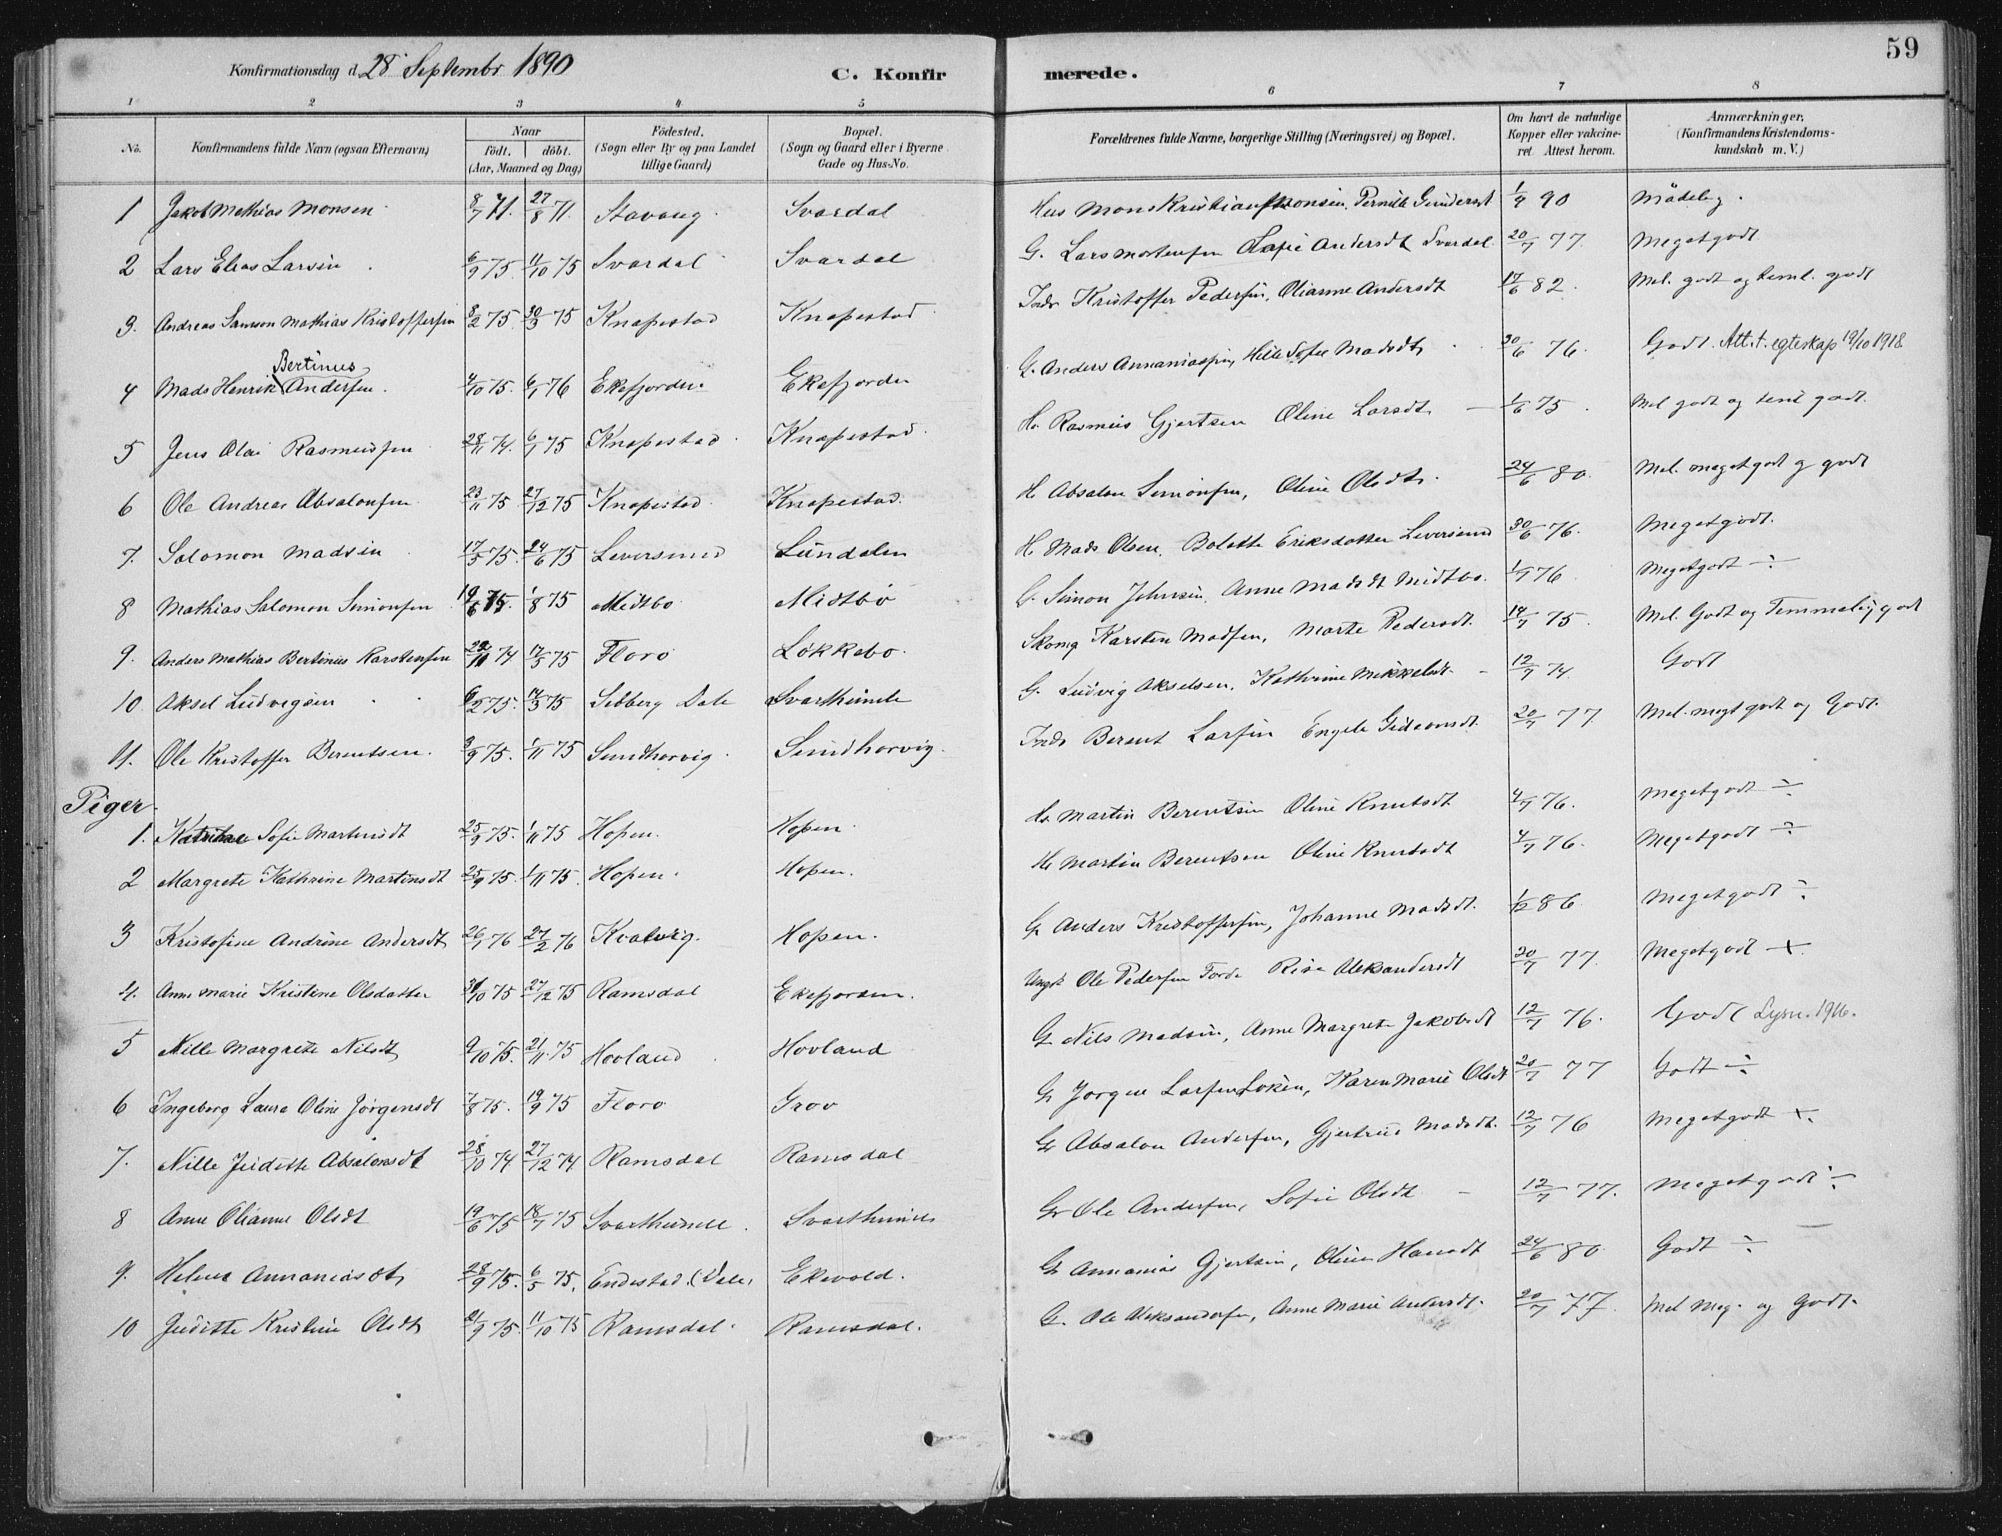 SAB, Kinn sokneprestembete, H/Haa/Haae/L0001: Ministerialbok nr. E 1, 1890-1916, s. 59